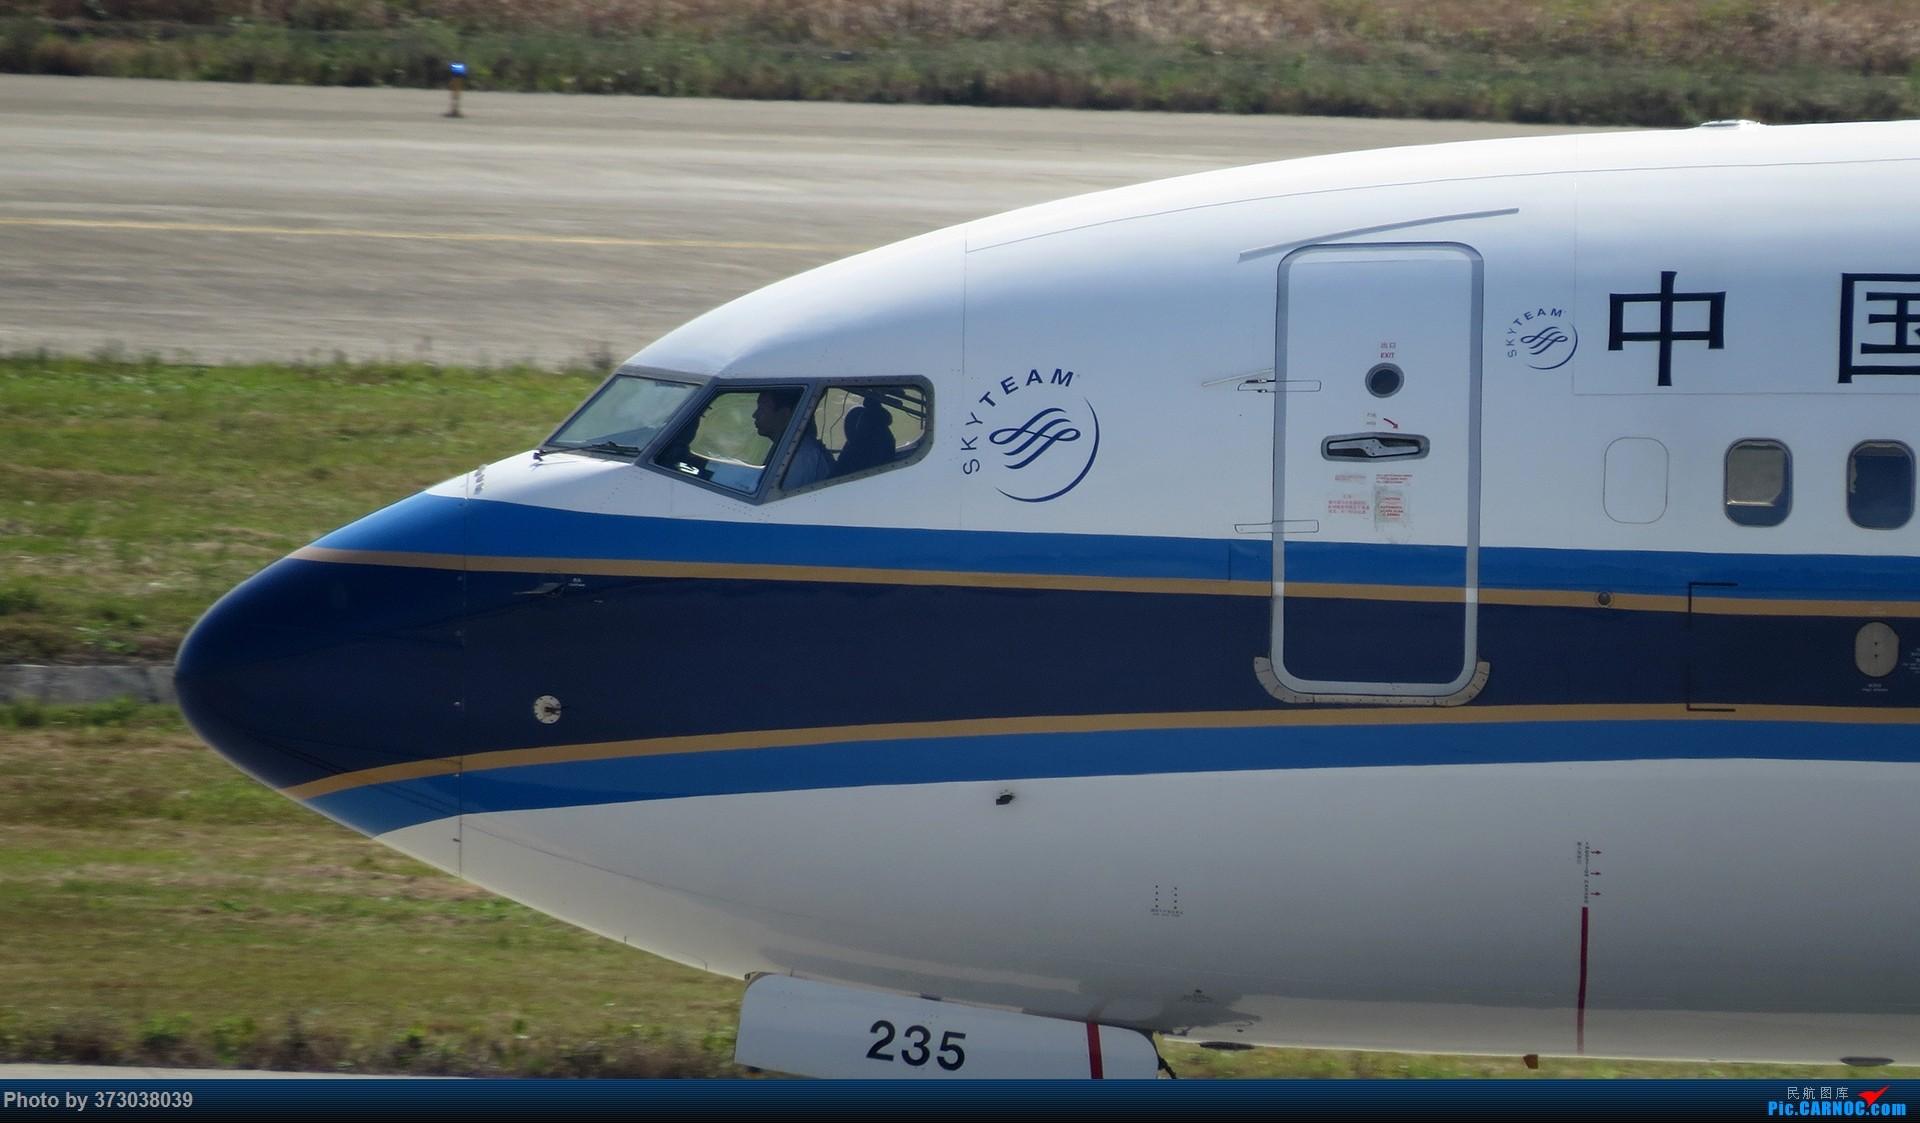 Re:[原创]【杭州飞友会 】50周年,烂大街的波音737 杭州飞友接力照 BOEING 737-700 B-5235 中国杭州萧山国际机场